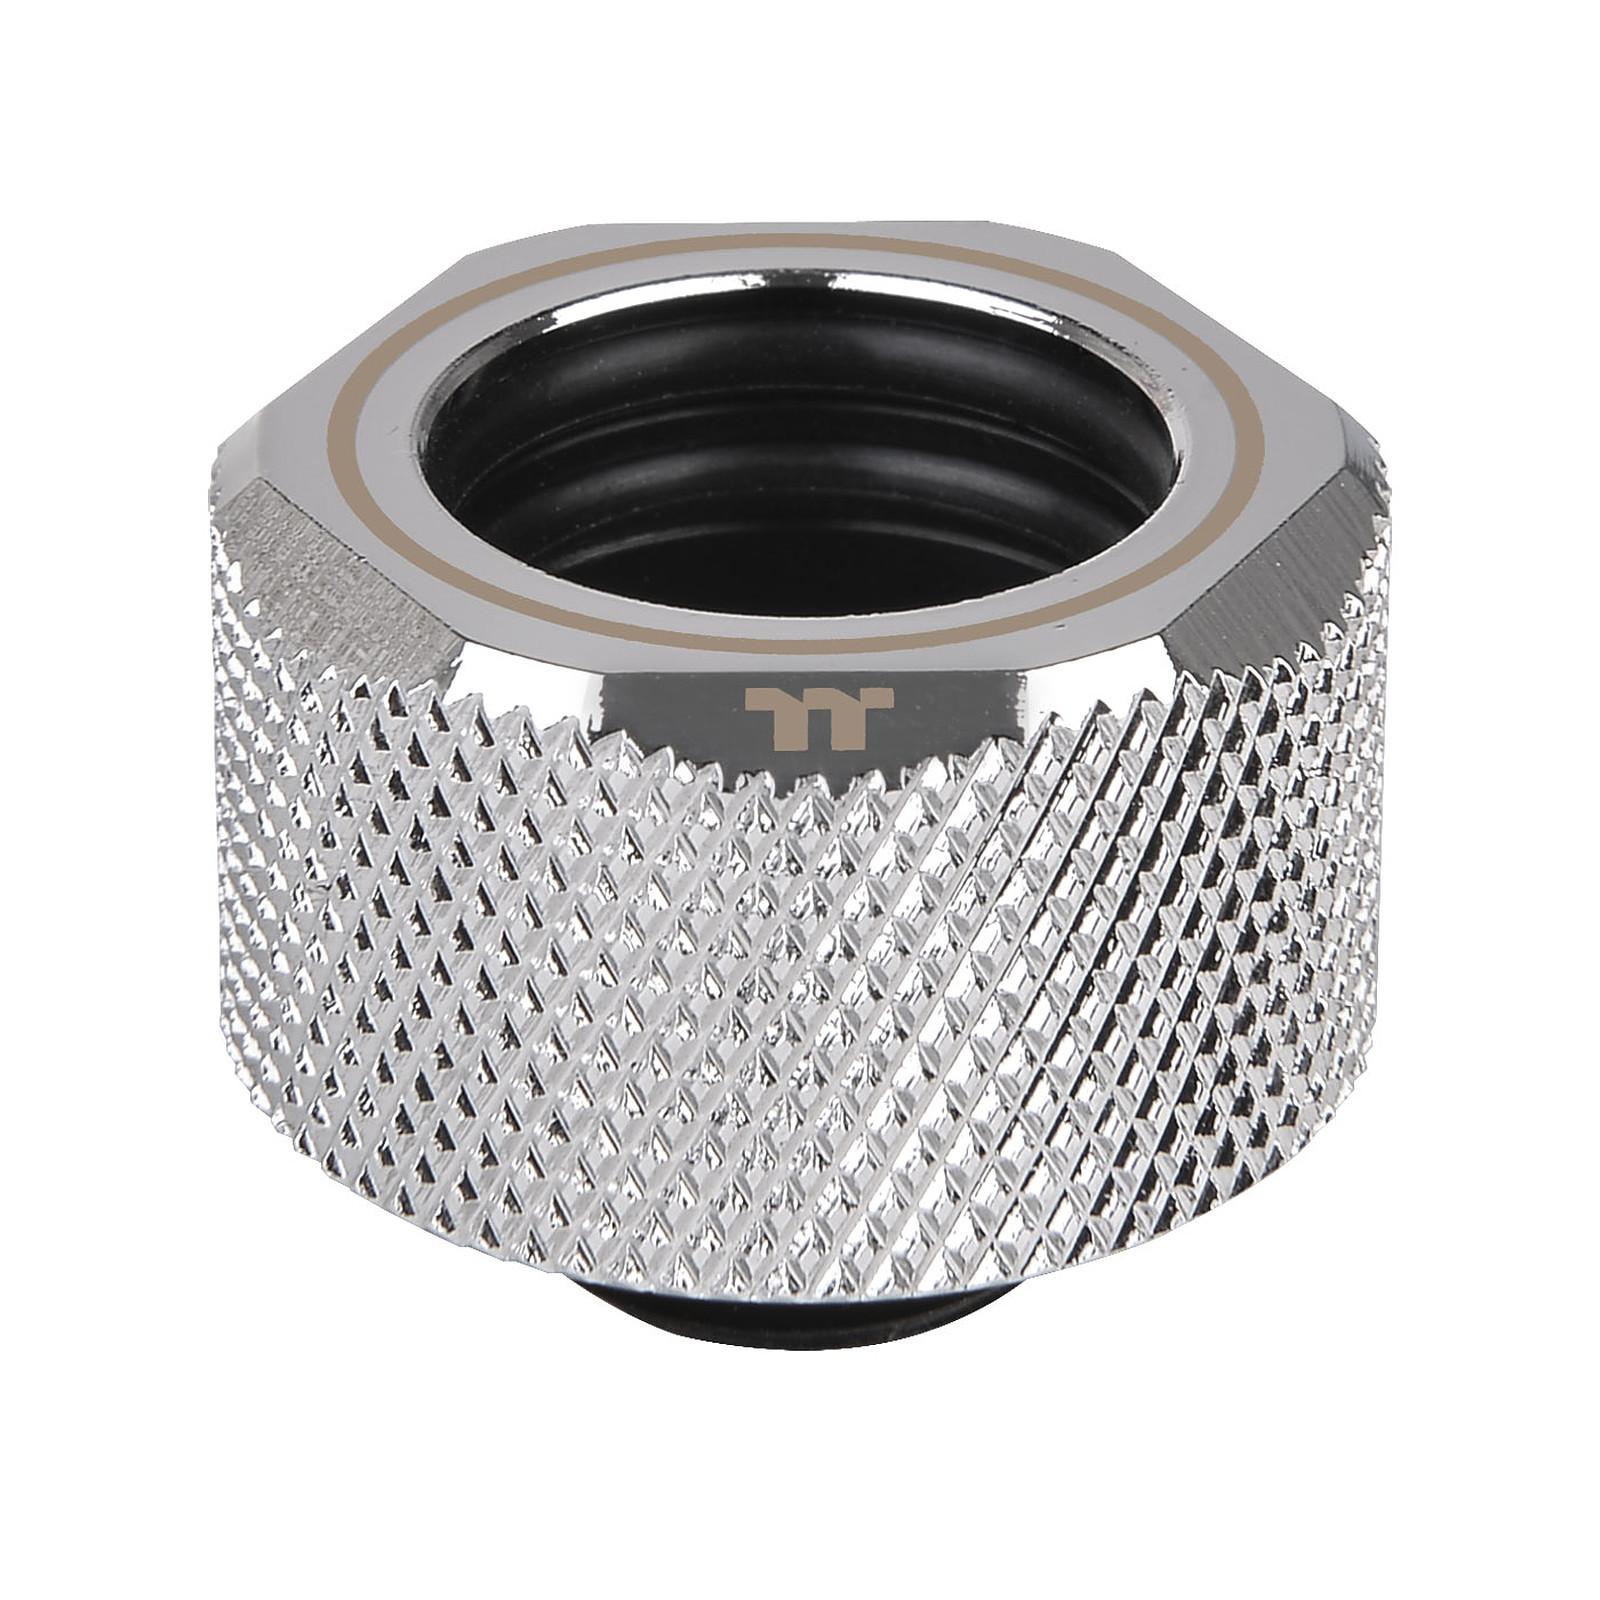 Thermaltake Pacific C-Pro G1/4 PETG 16 mm - Chrome